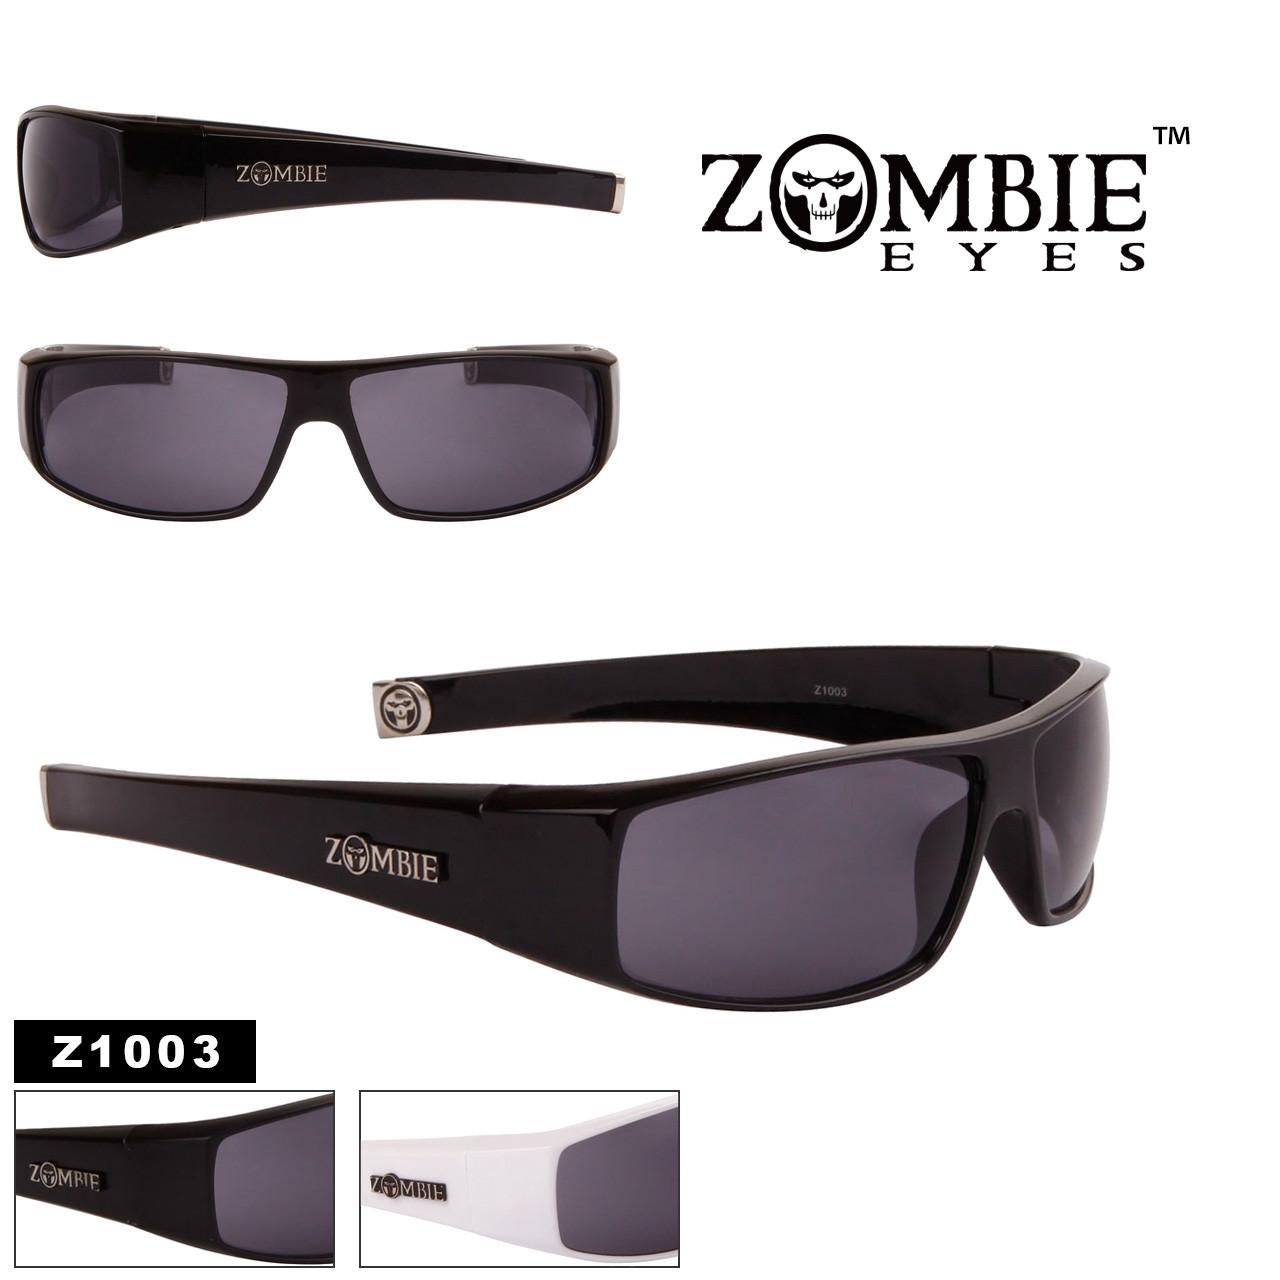 Zombie Eyes™ Men's Sunglasses - Style #Z1003